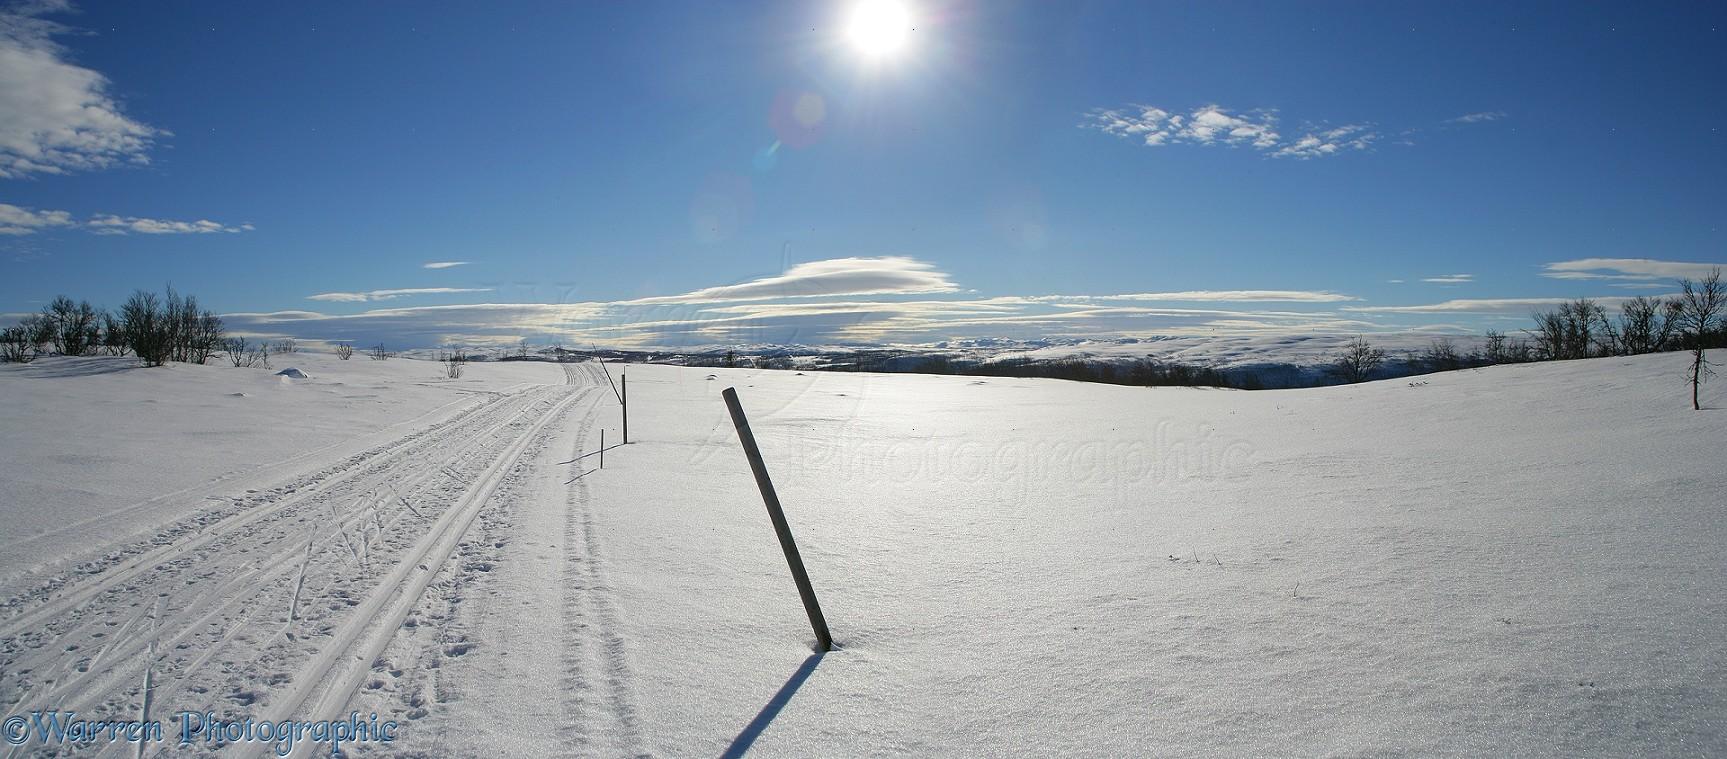 Snowy scene photo - WP11891